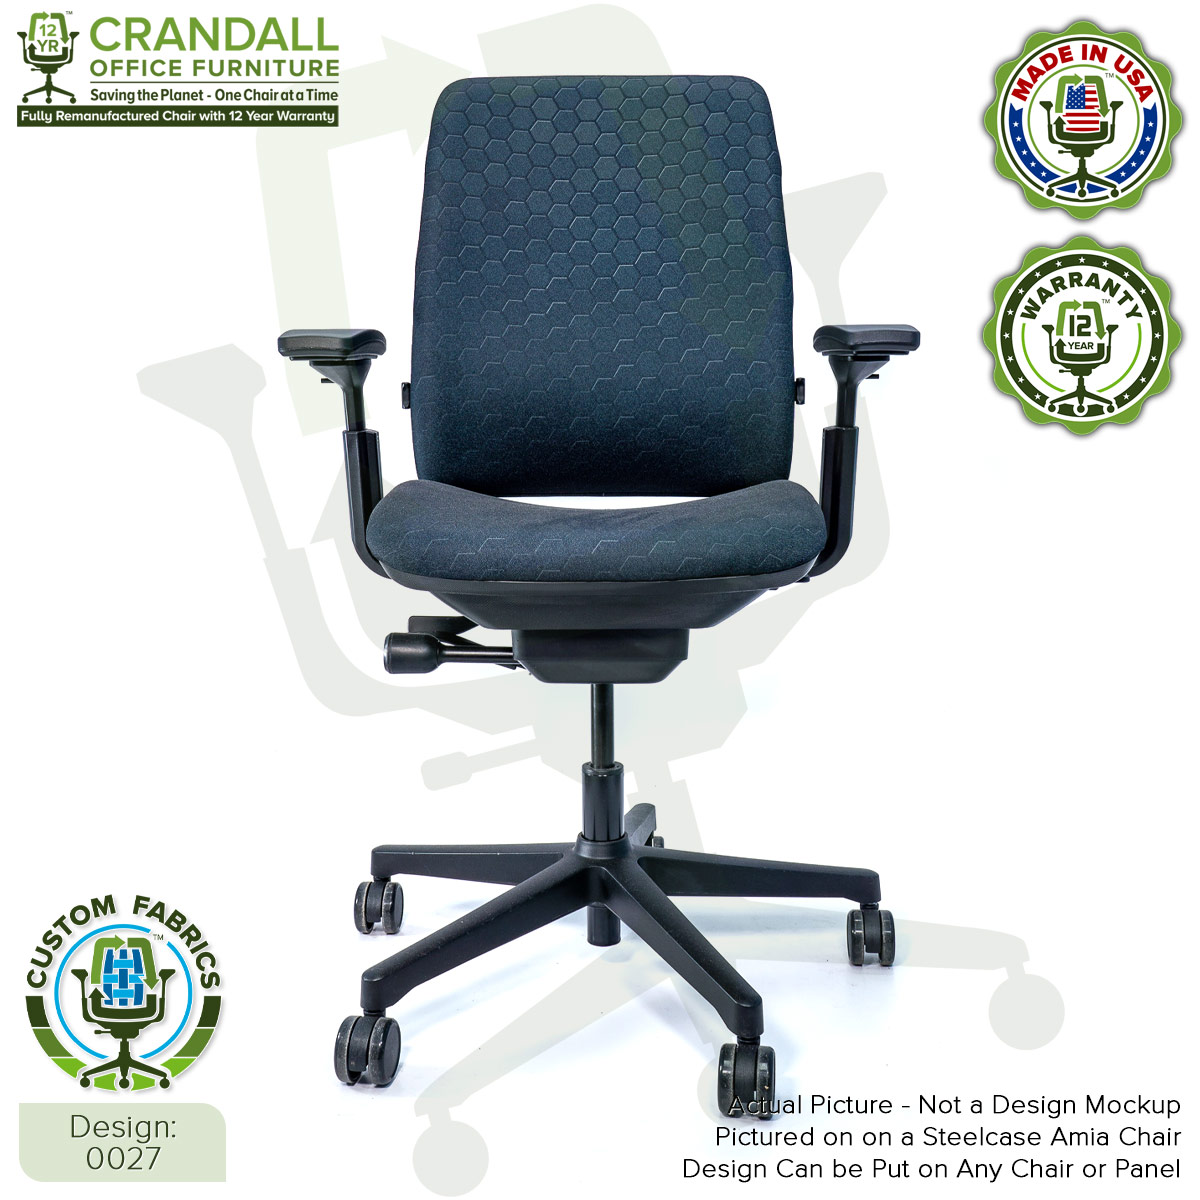 Custom Fabric Remanufactured Steelcase Amia Chair - Design 0027